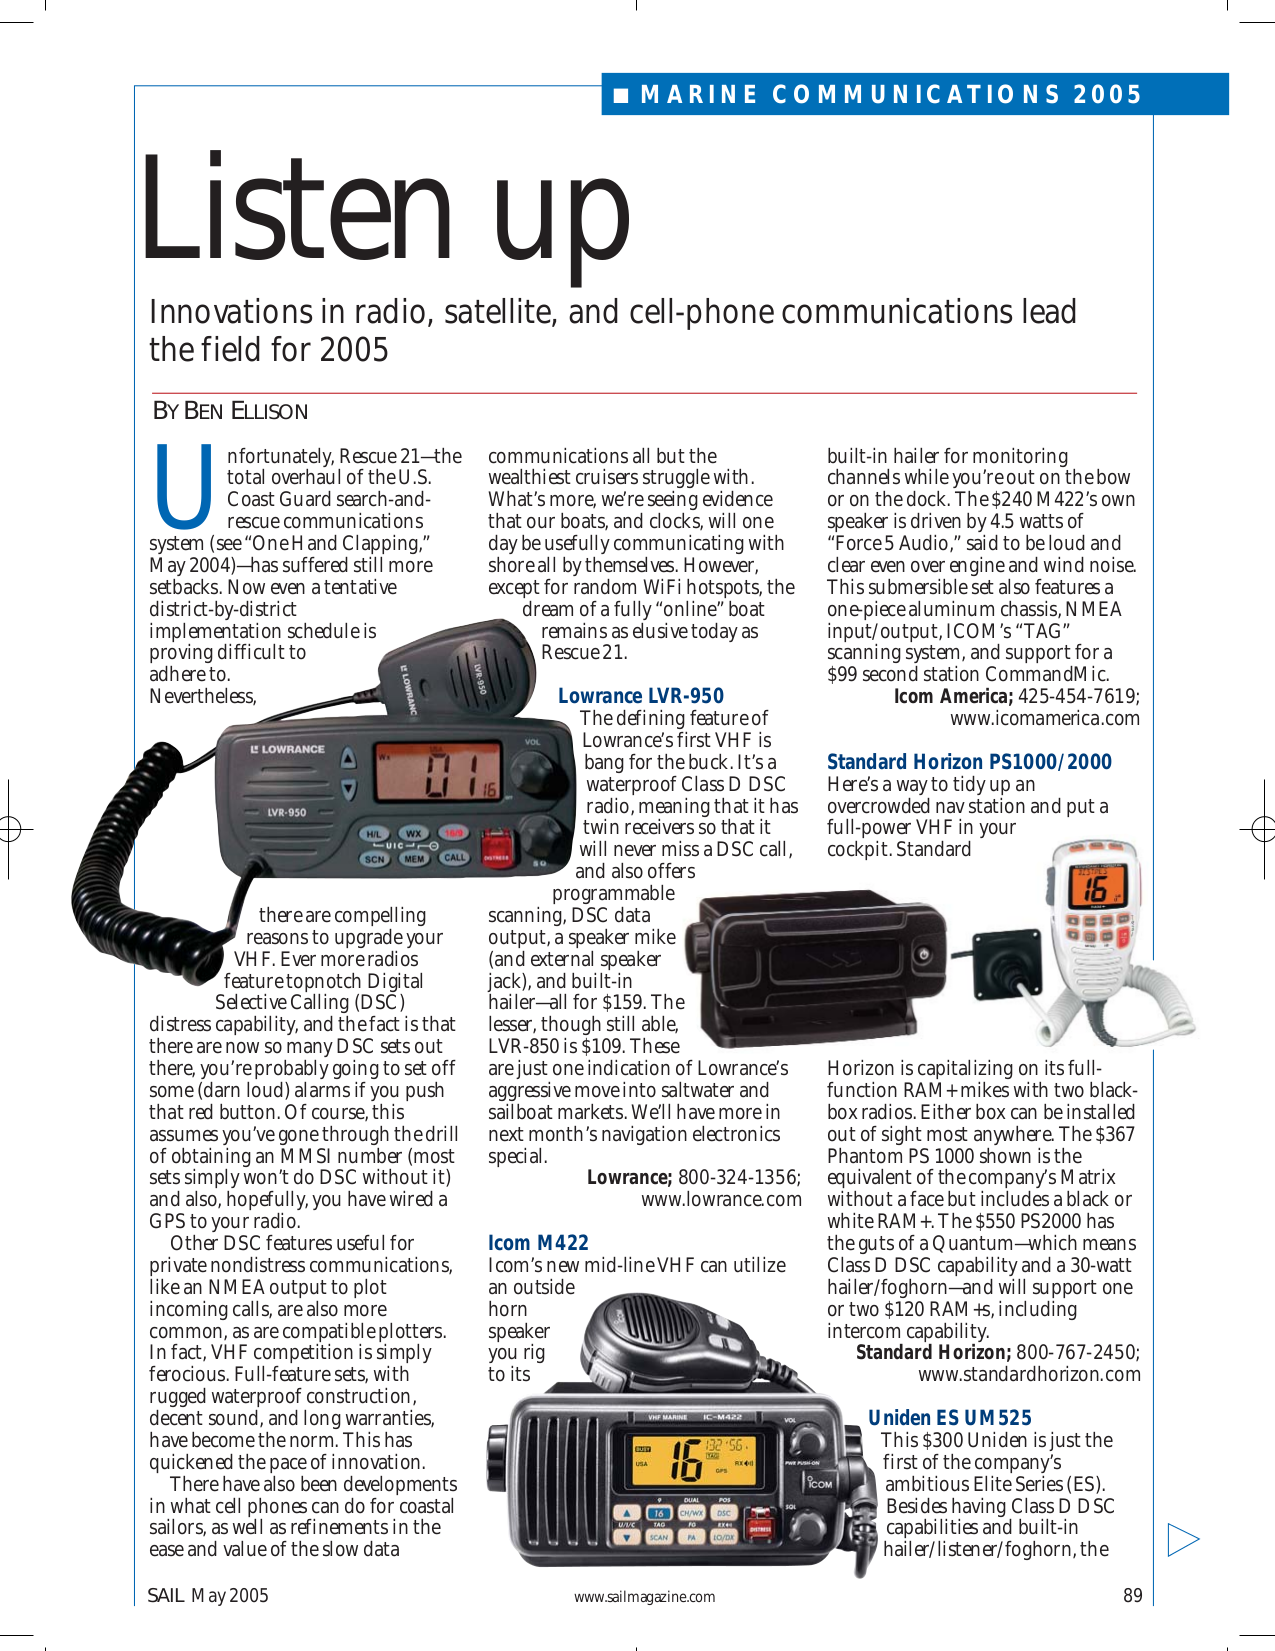 pdf for Lowrance Radio LVR-850 manual